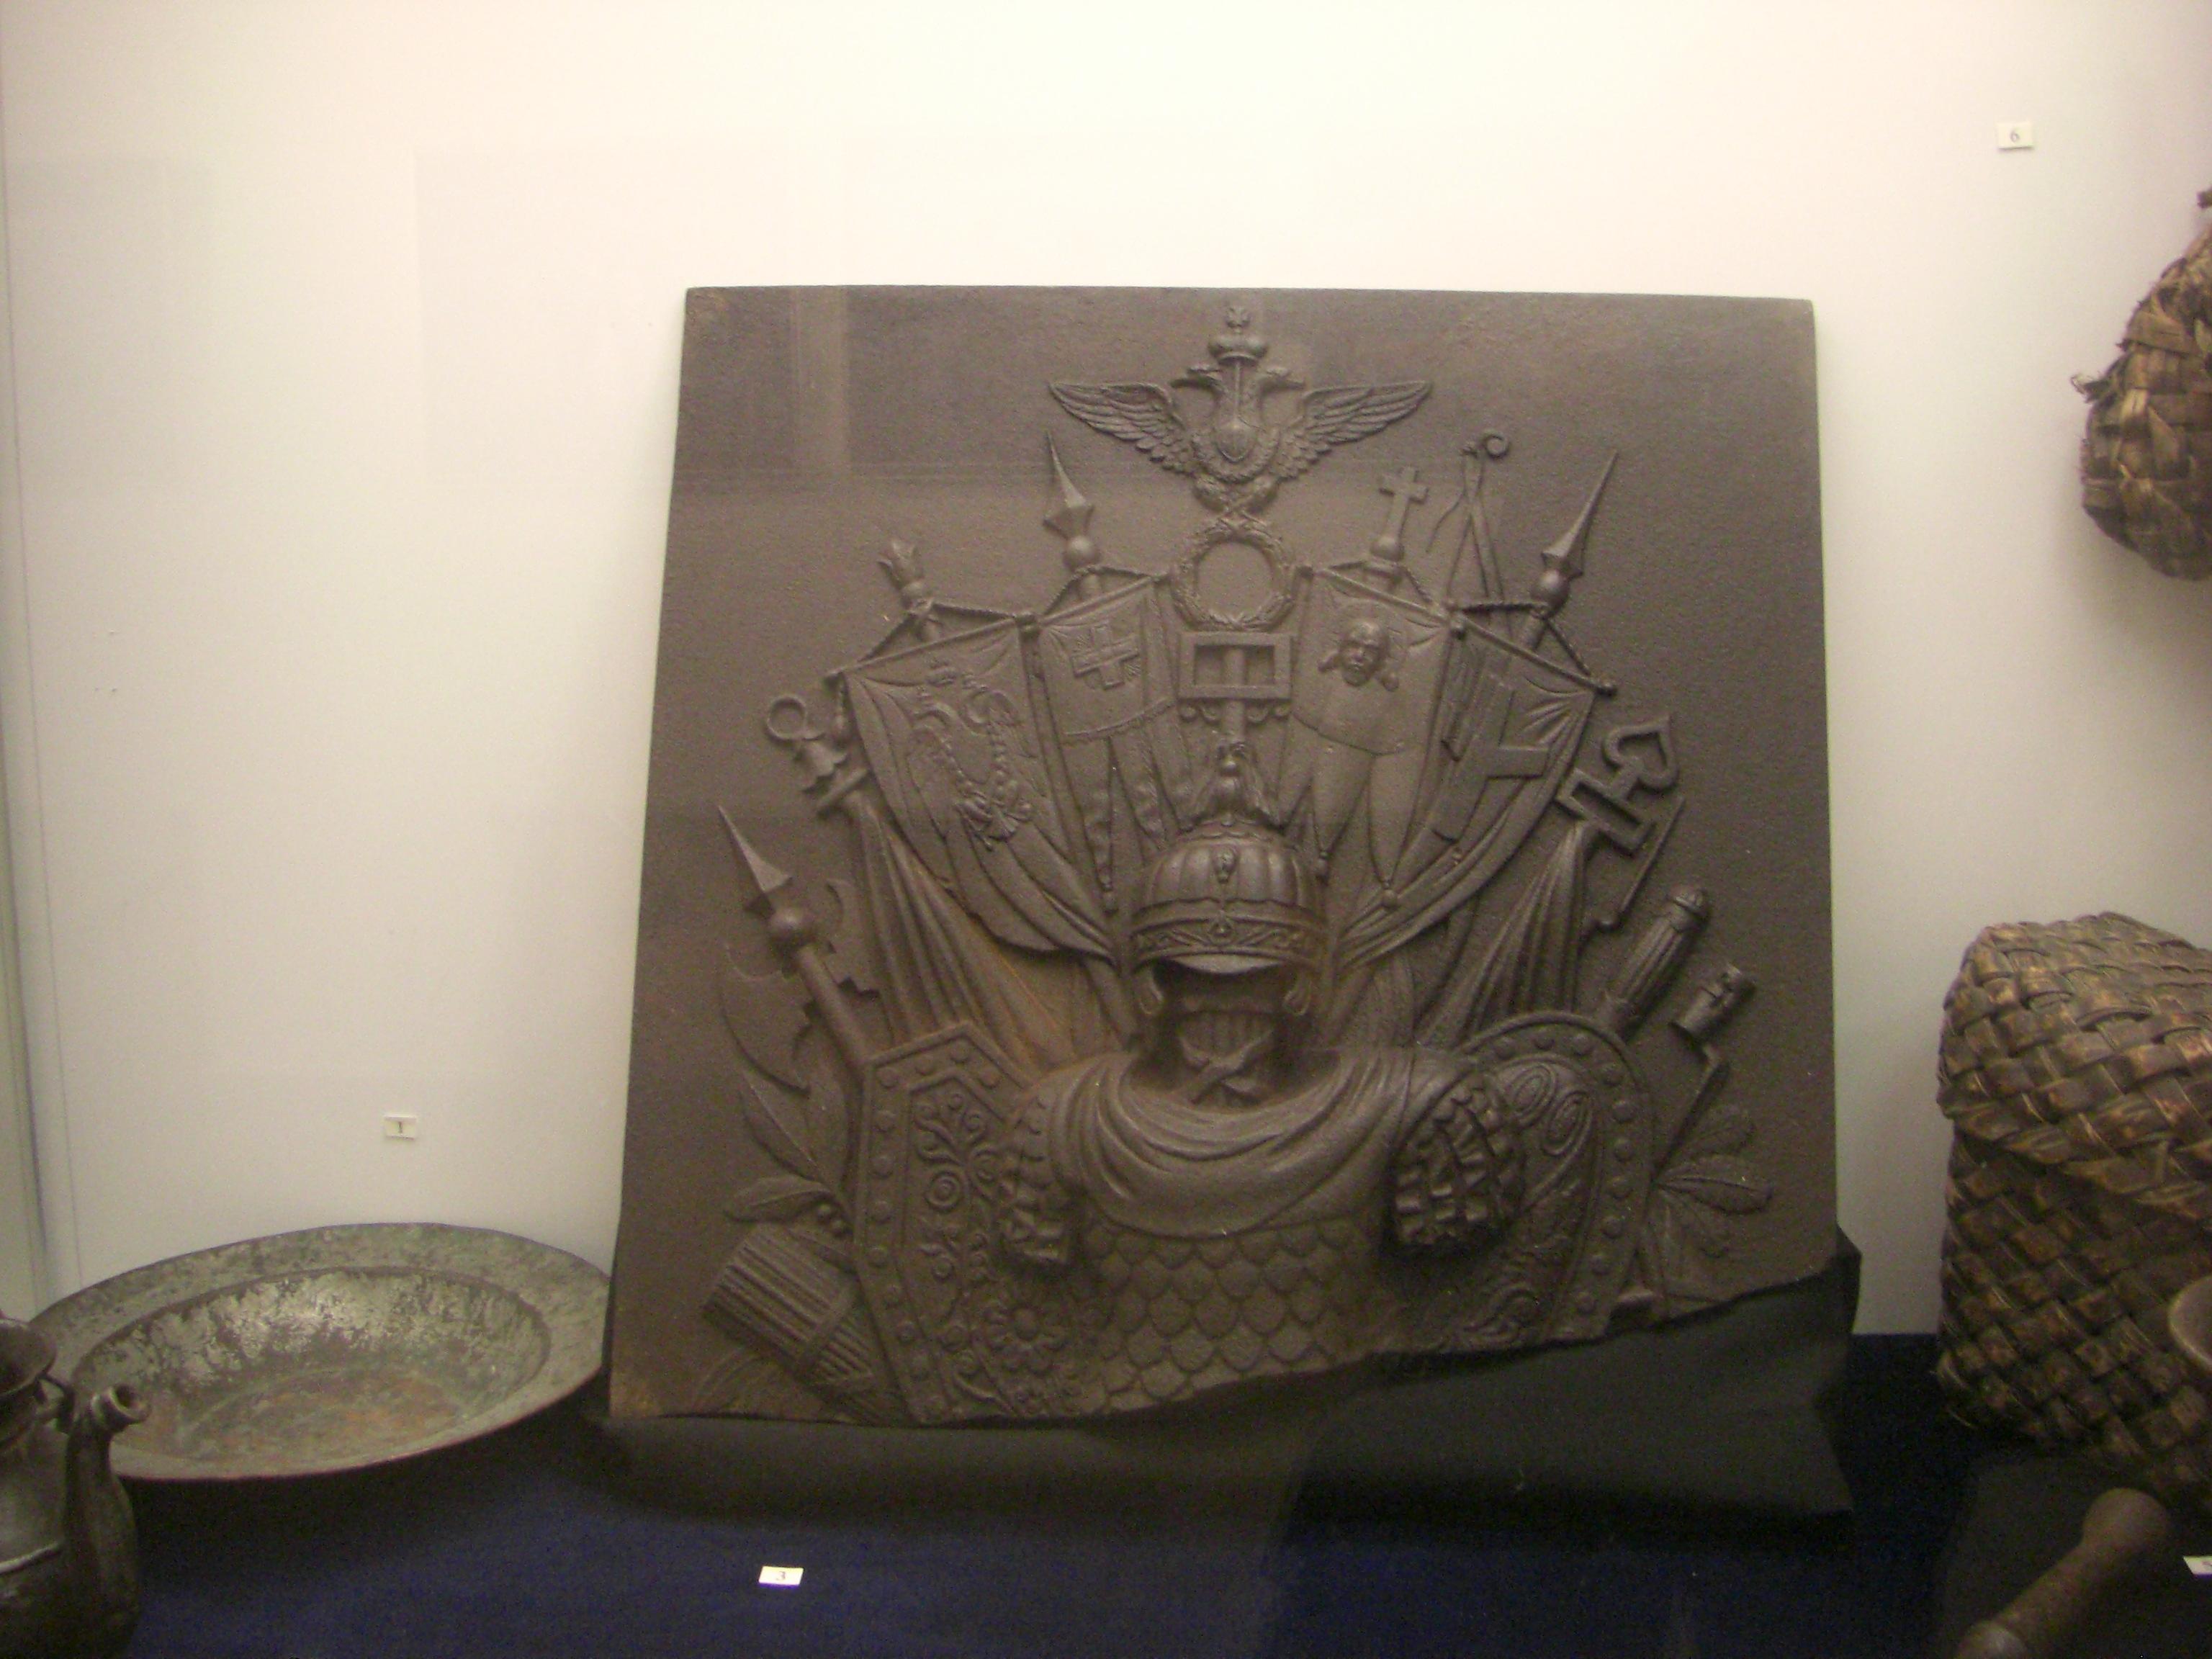 Фрагмент той самой плиты с памятника Александру I (12.09.2014)